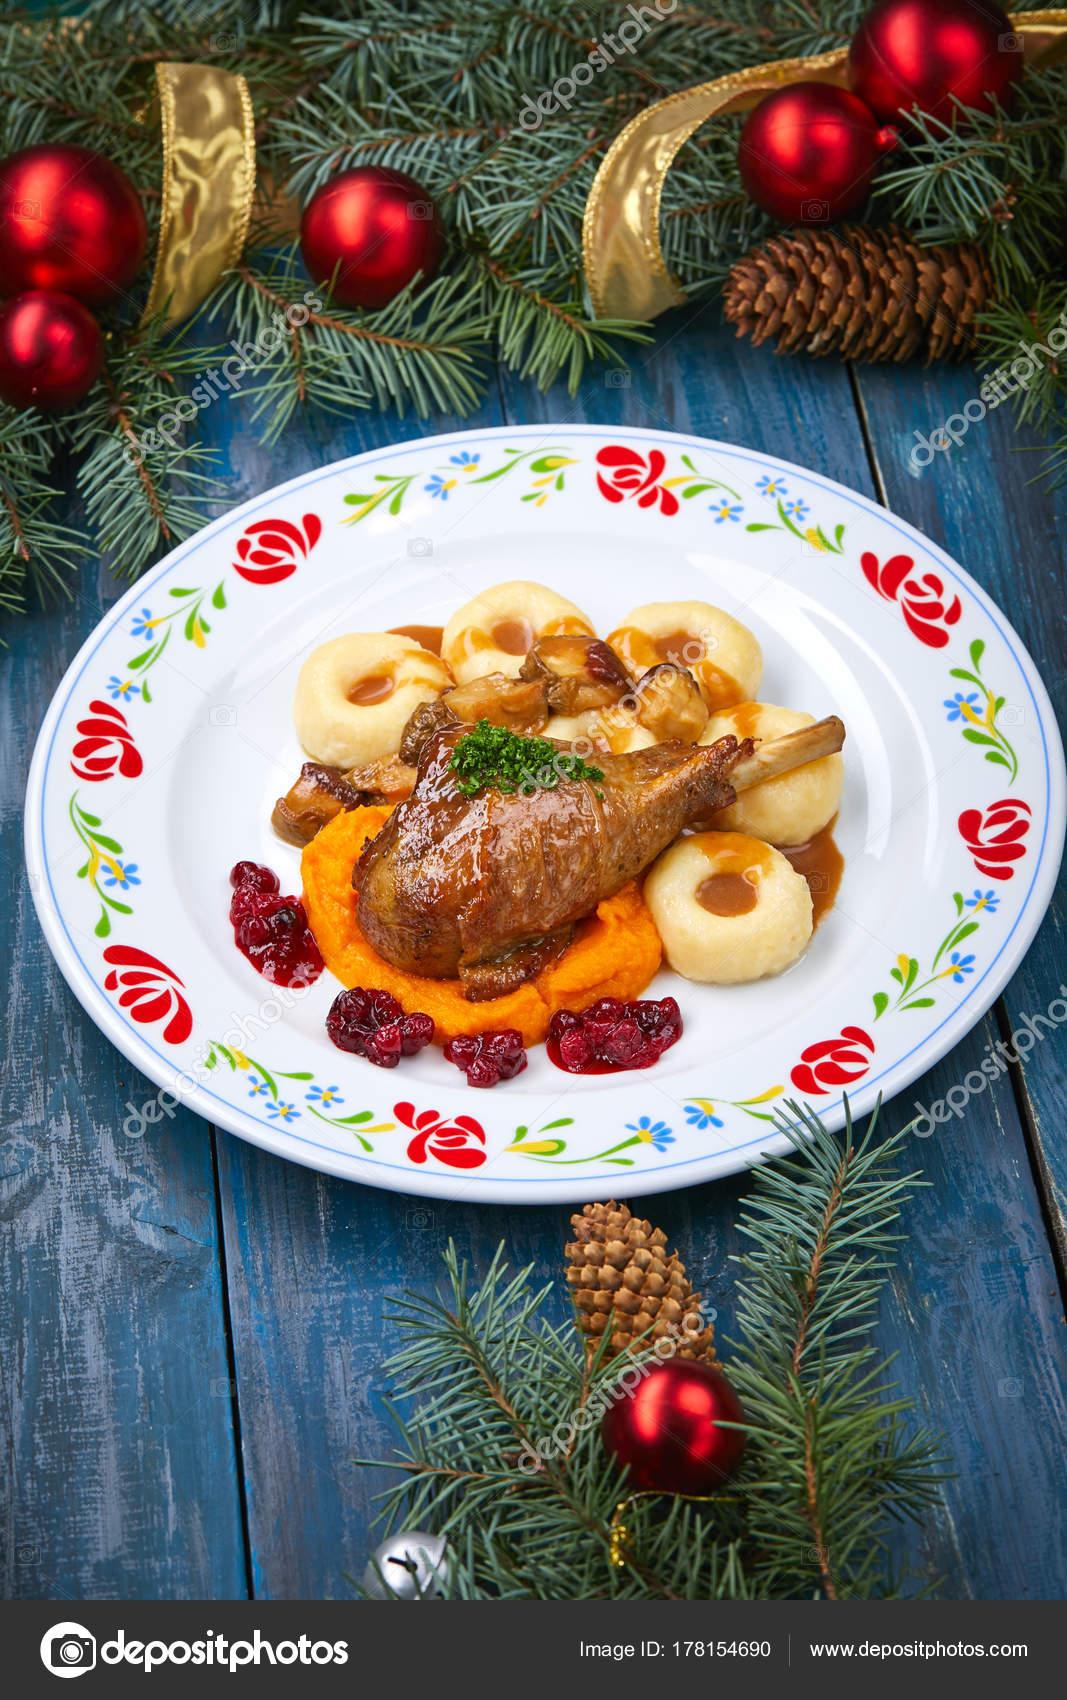 Roasted Turkey Leg Pumpkin Puree White Plate Christmas Decorations